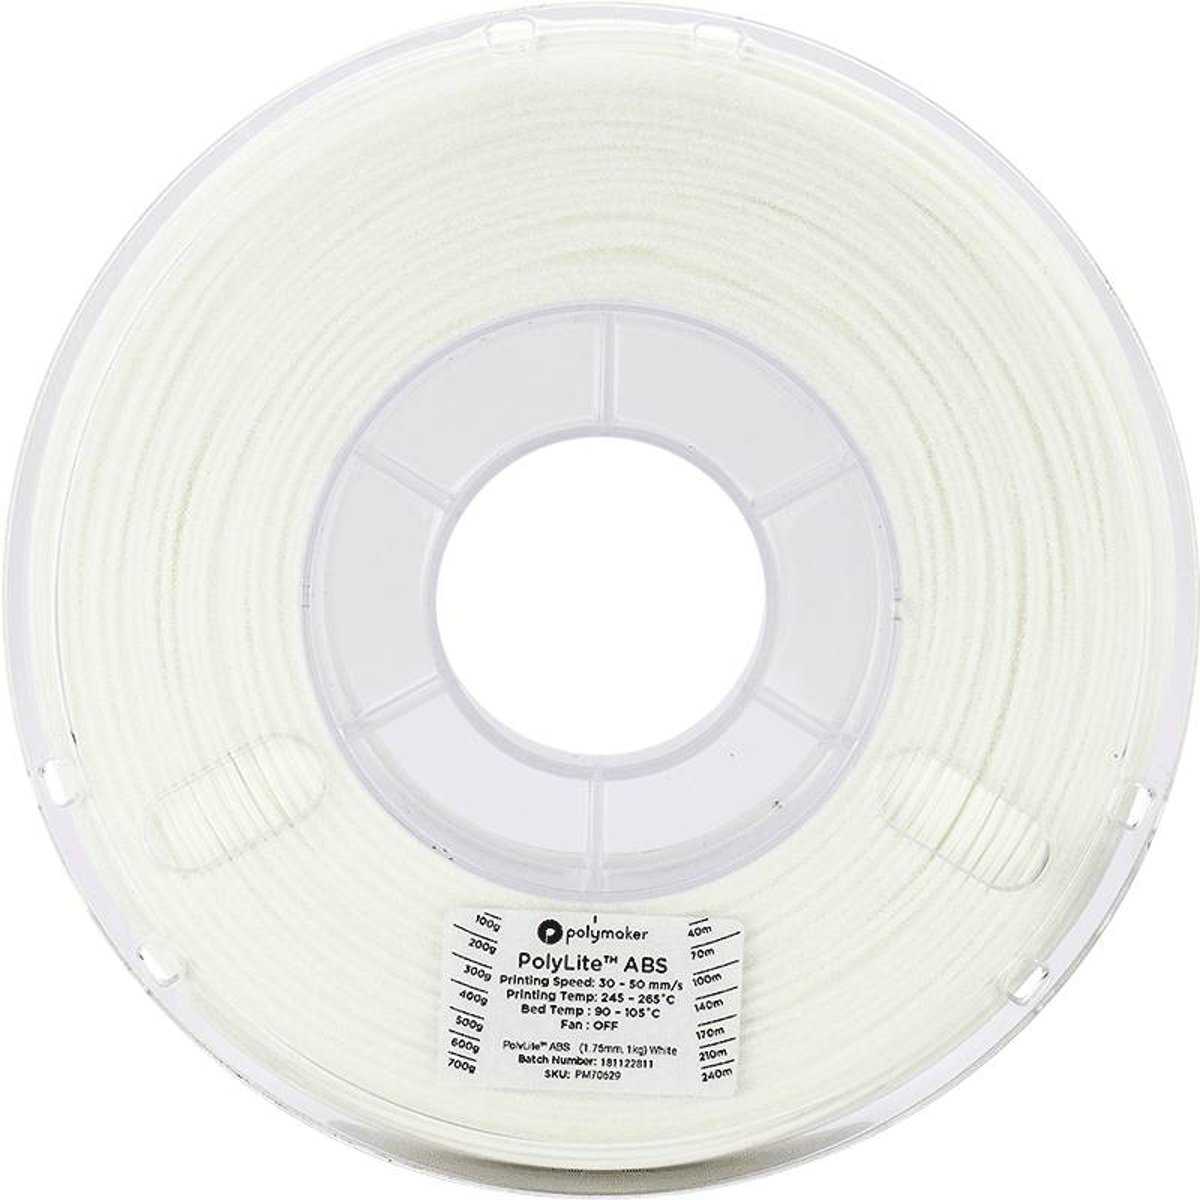 Polymaker PolyLite ABS White 1kg kopen